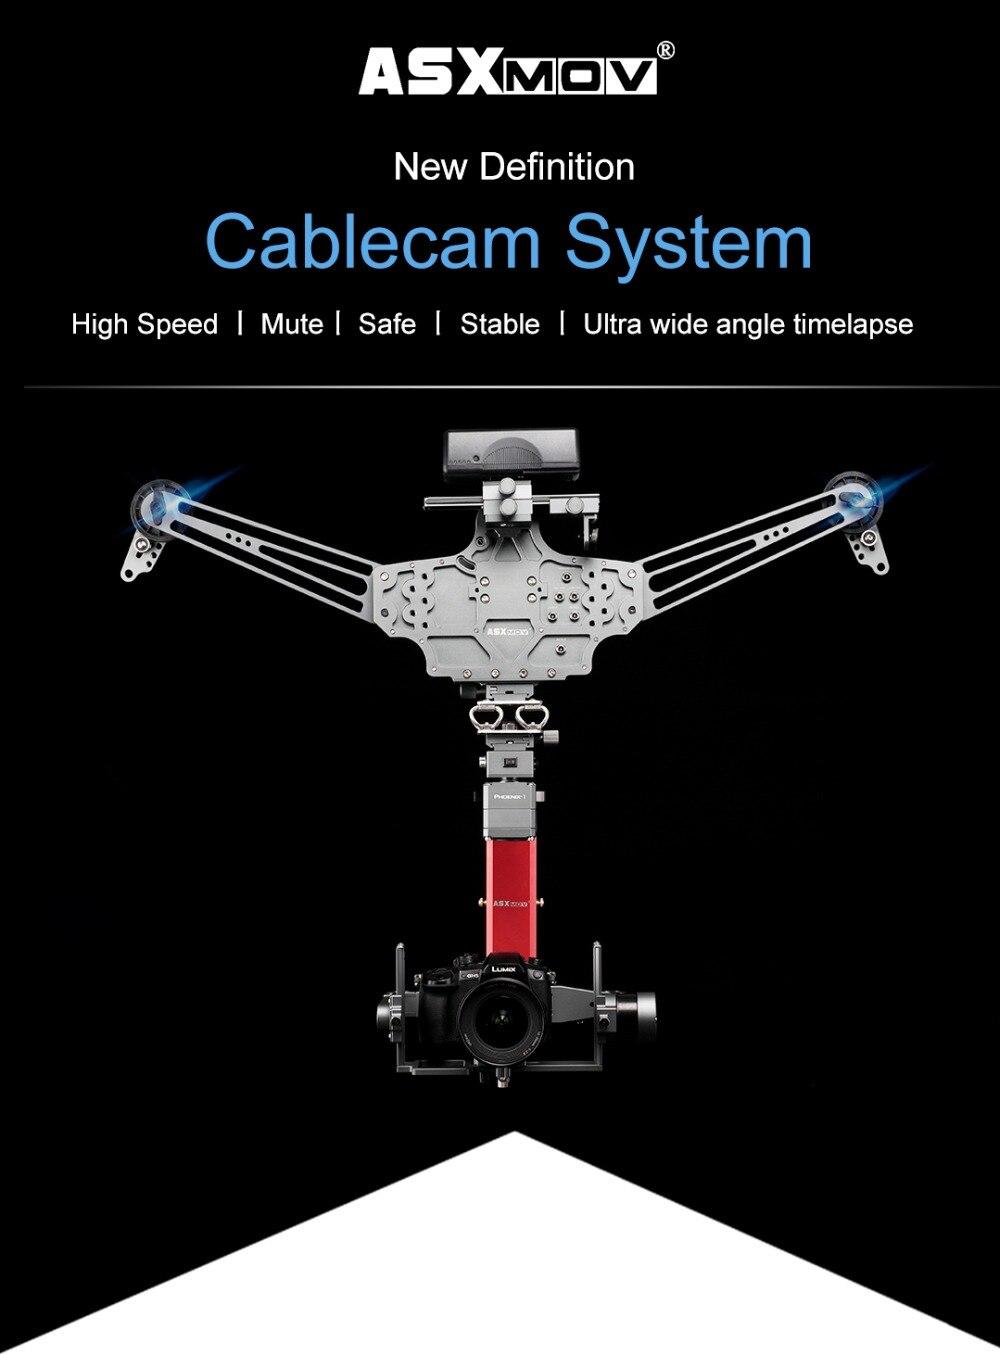 ASXMOV 4 m/s 20 kg carga útil panorama timelapse disparo de vídeo aéreo cardán enfoque cablecam sistema APP control inalámbrico